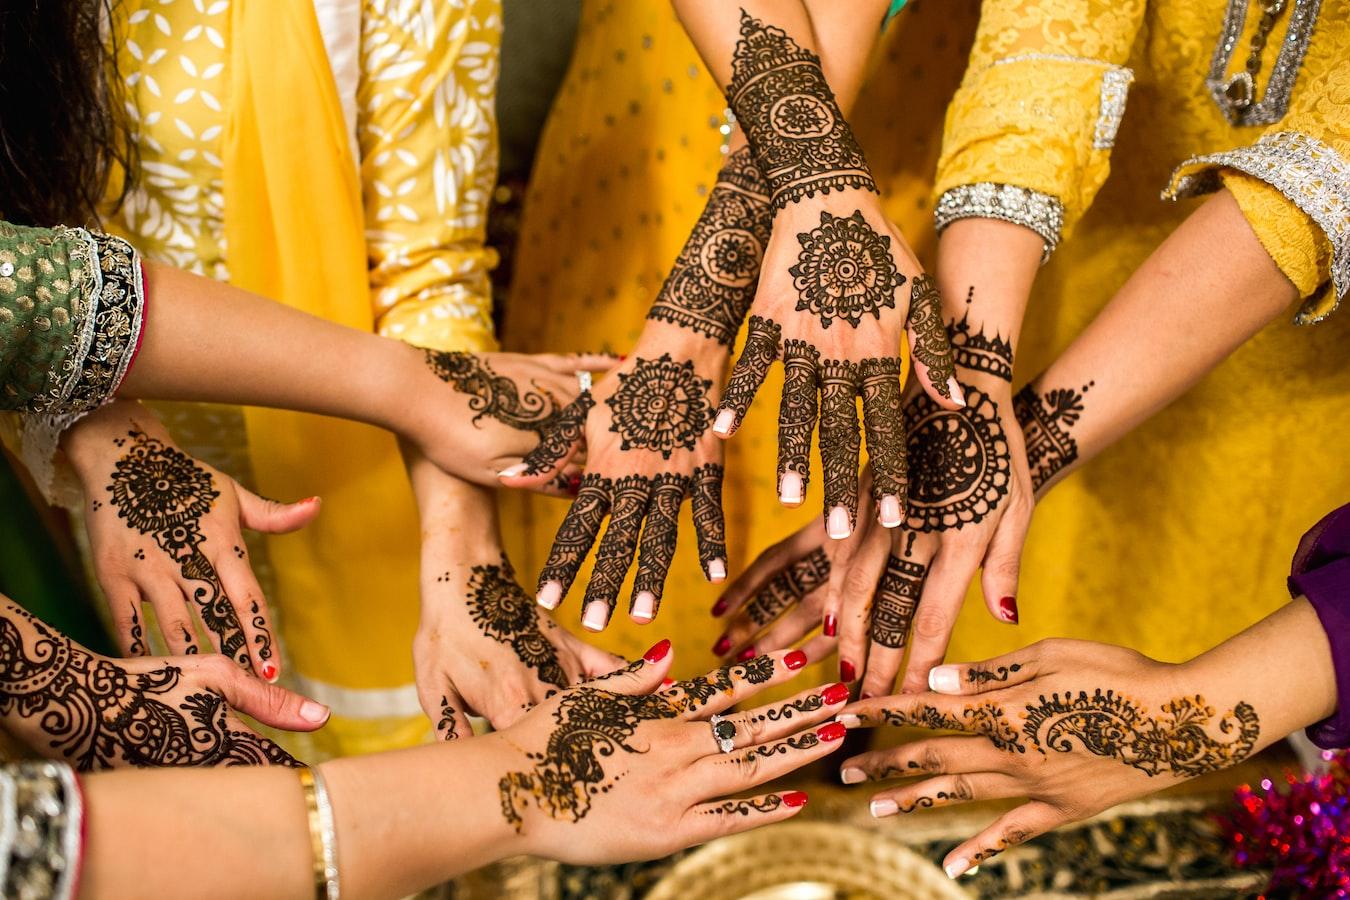 Hands with henna (mehendi) on them